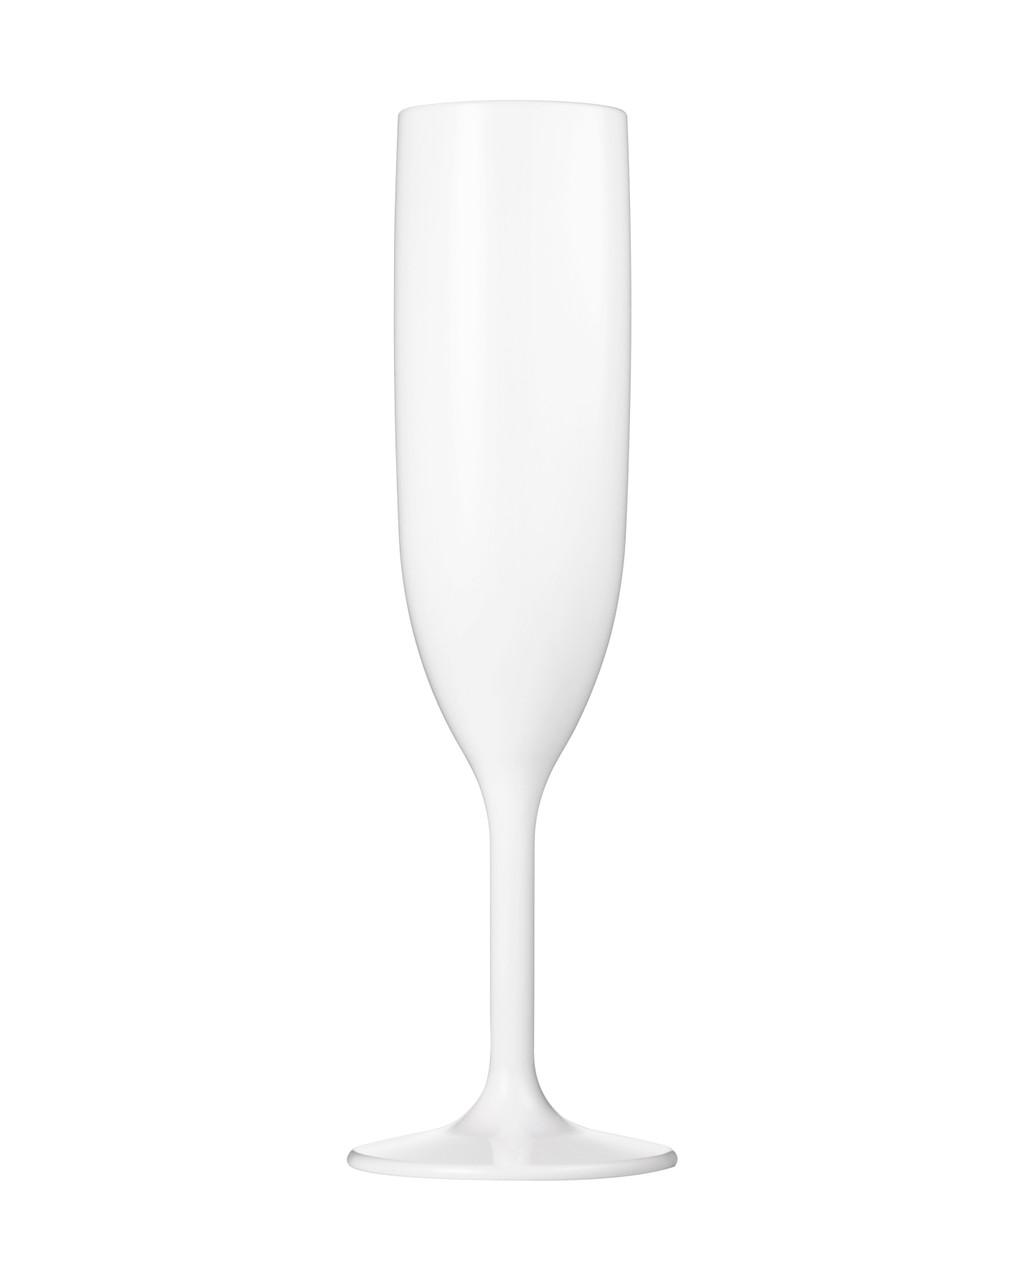 dishwasher safe Unbreakable Tritan champagne glasses x 8